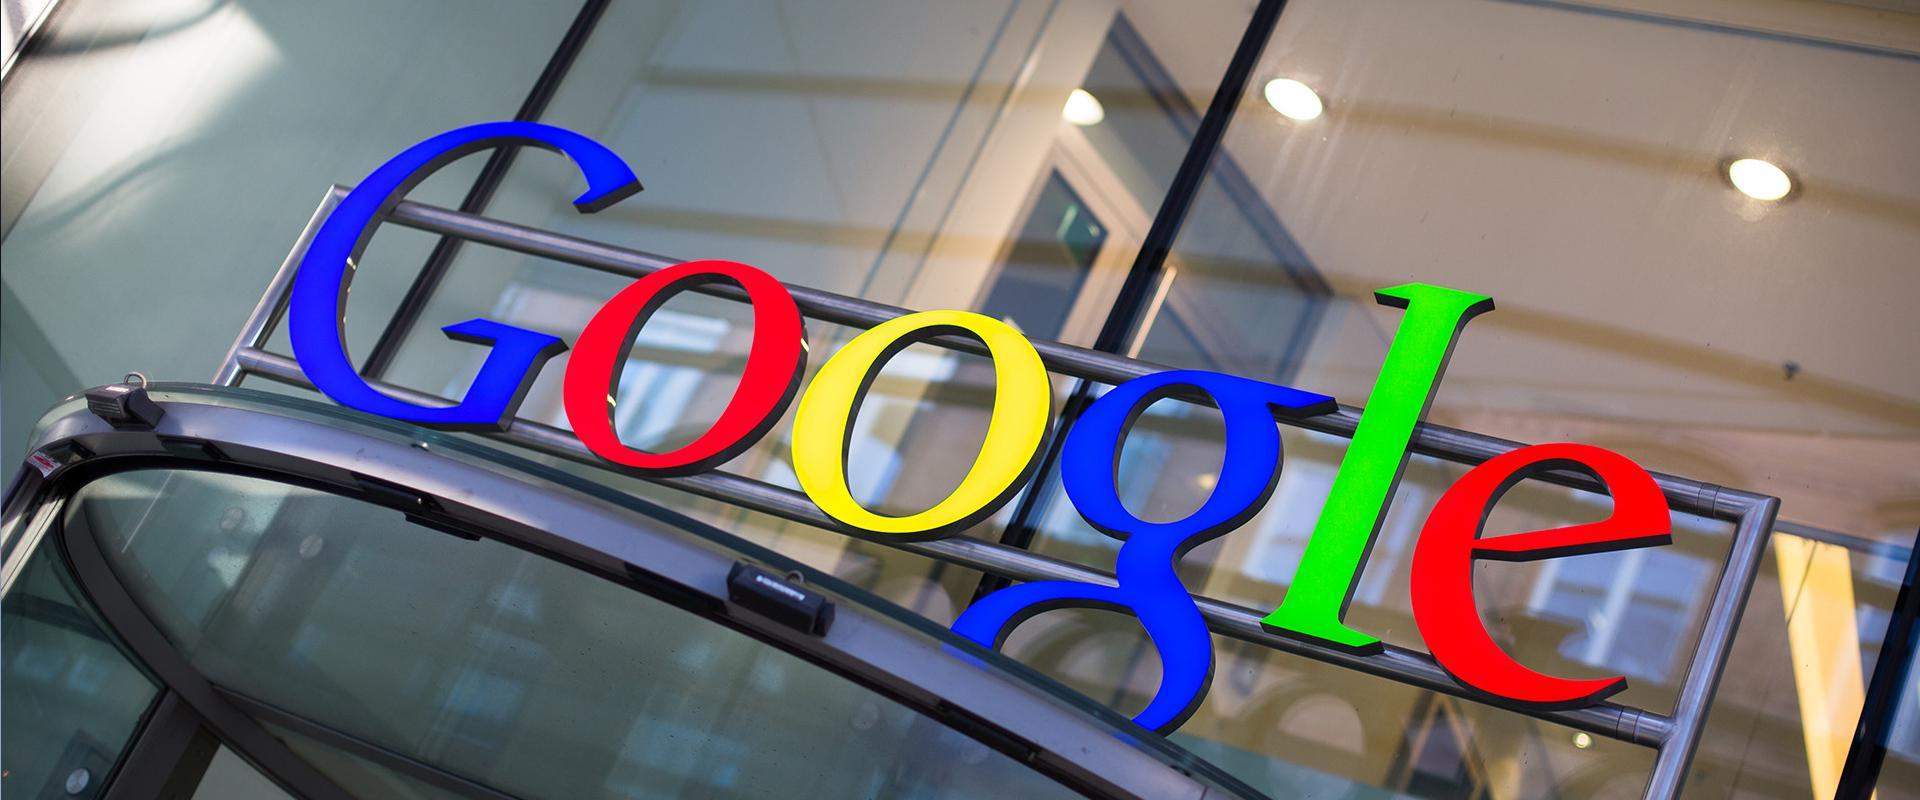 Šefovi europskih novinskih agencija kritiziraju Facebook i Google